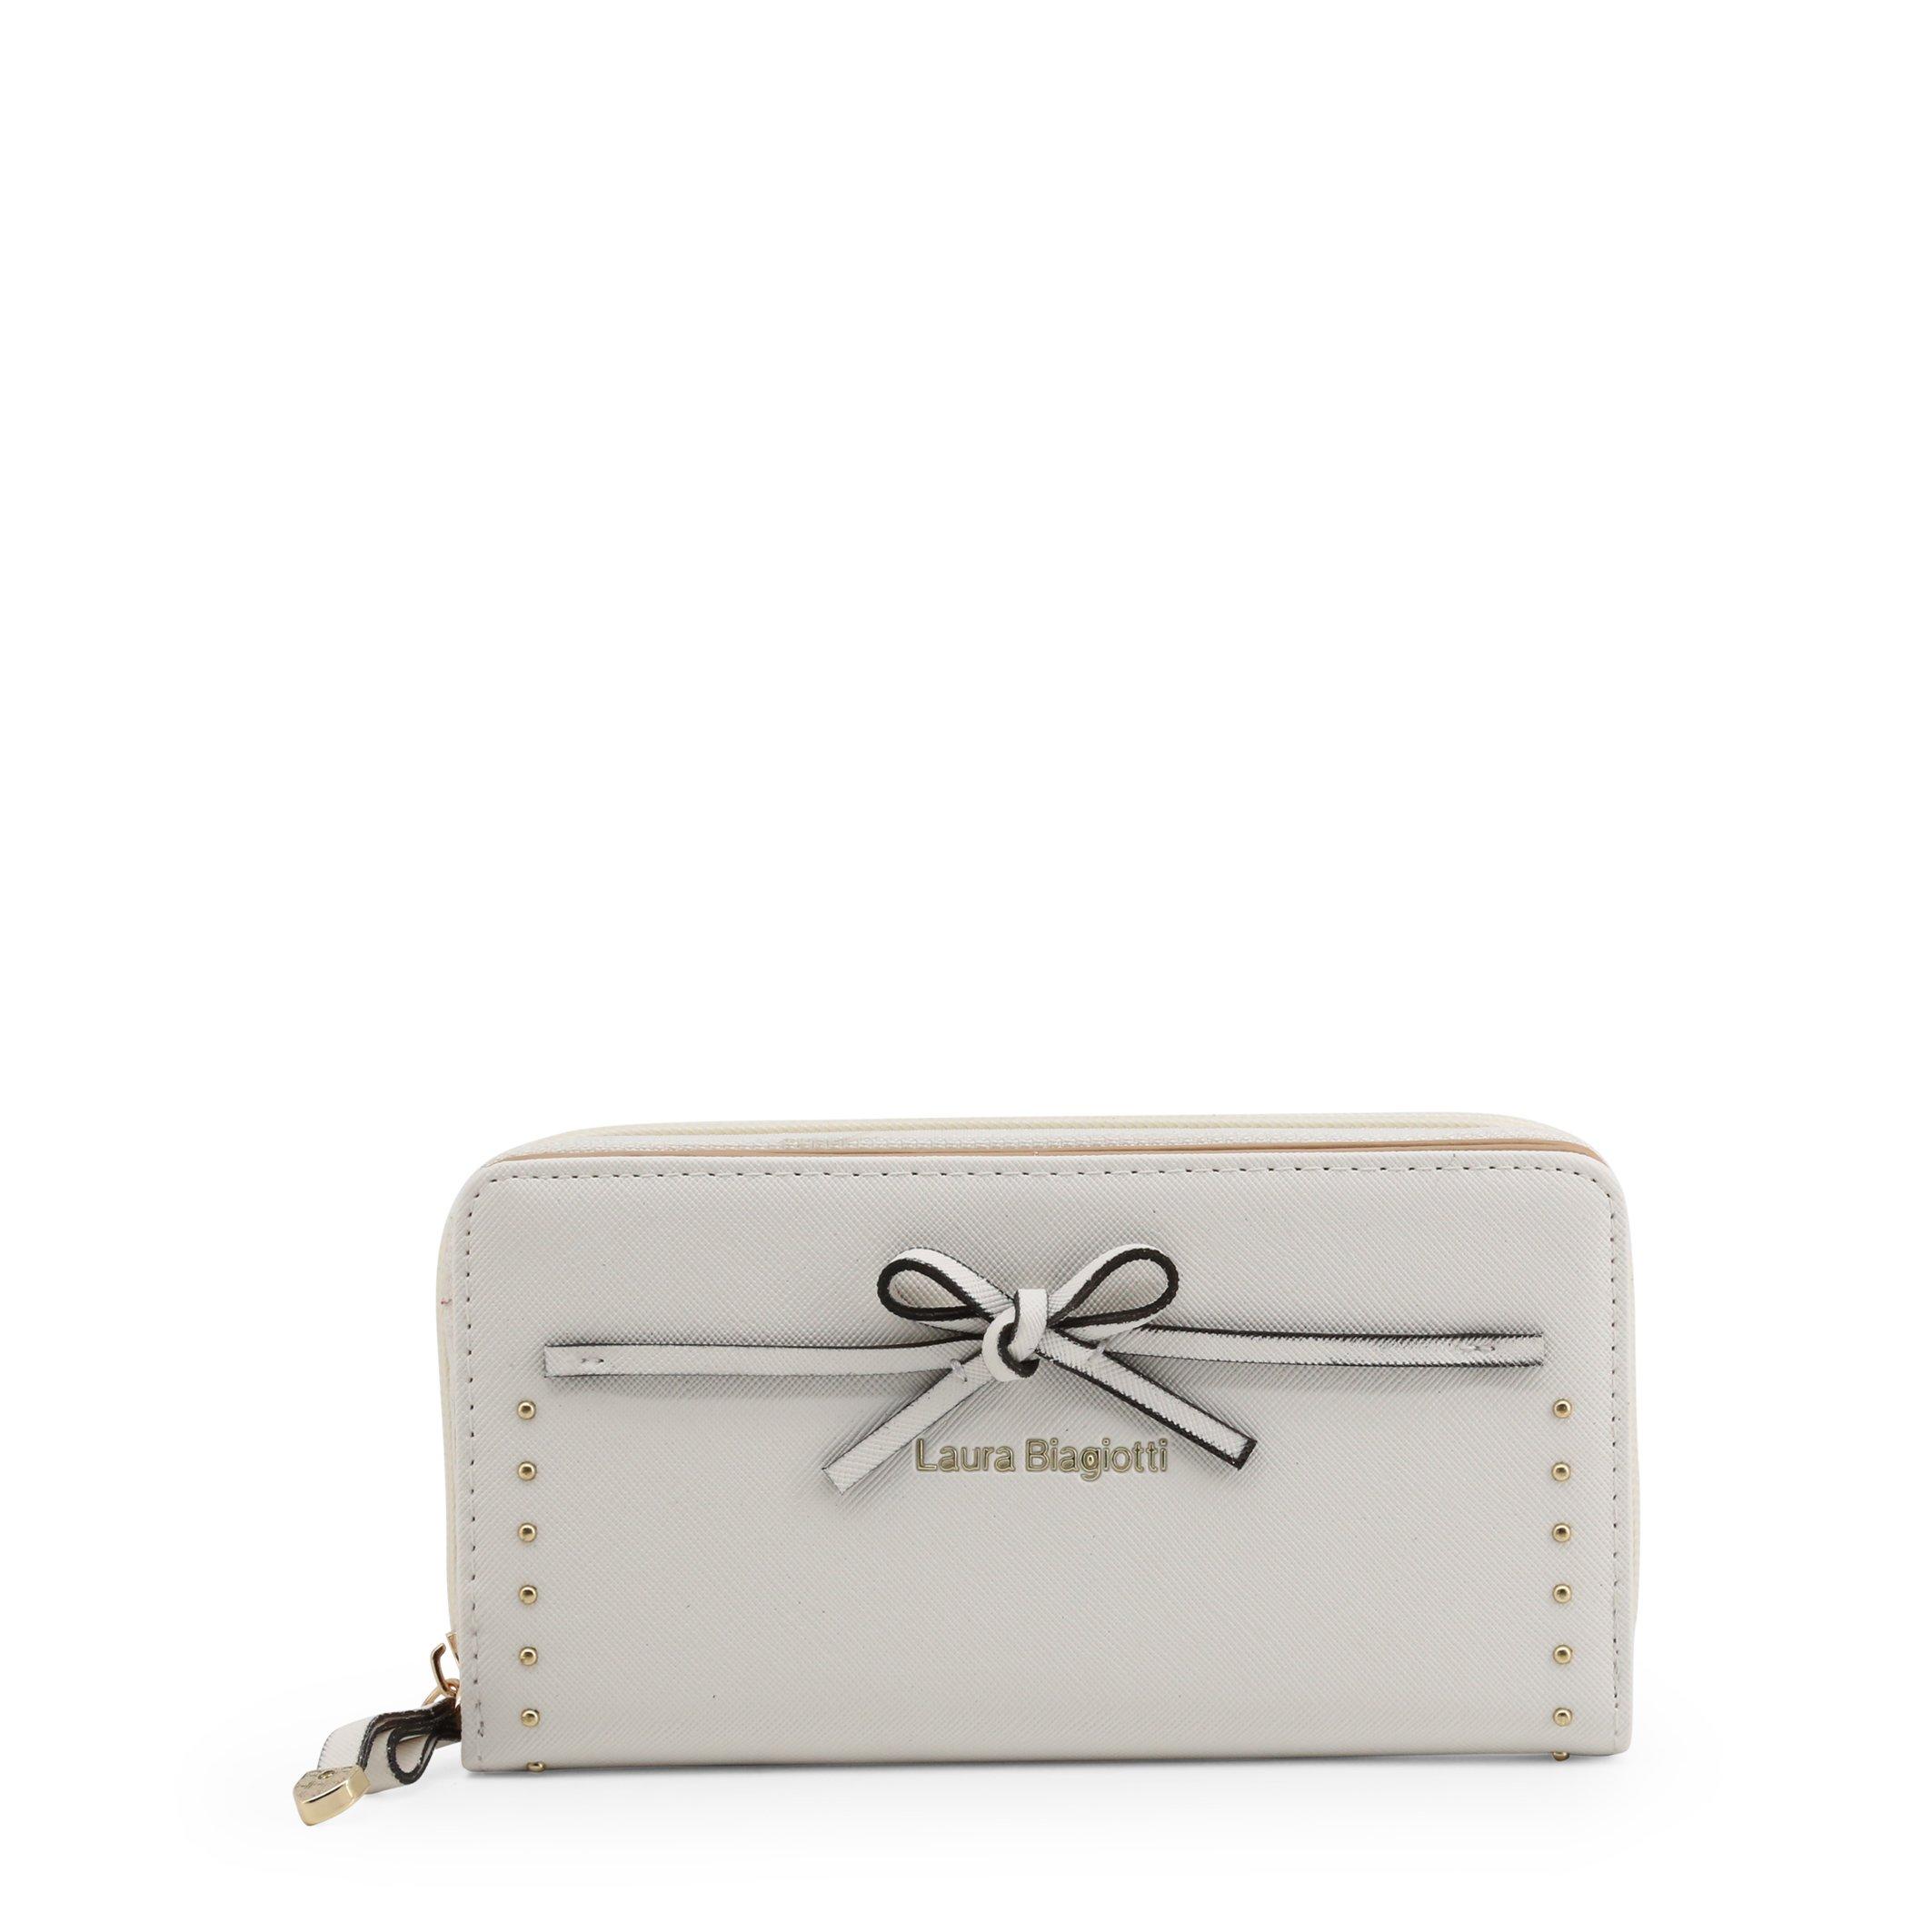 Laura Biagiotti Women's Wallet Various Colours Collar_513-67 - white NOSIZE